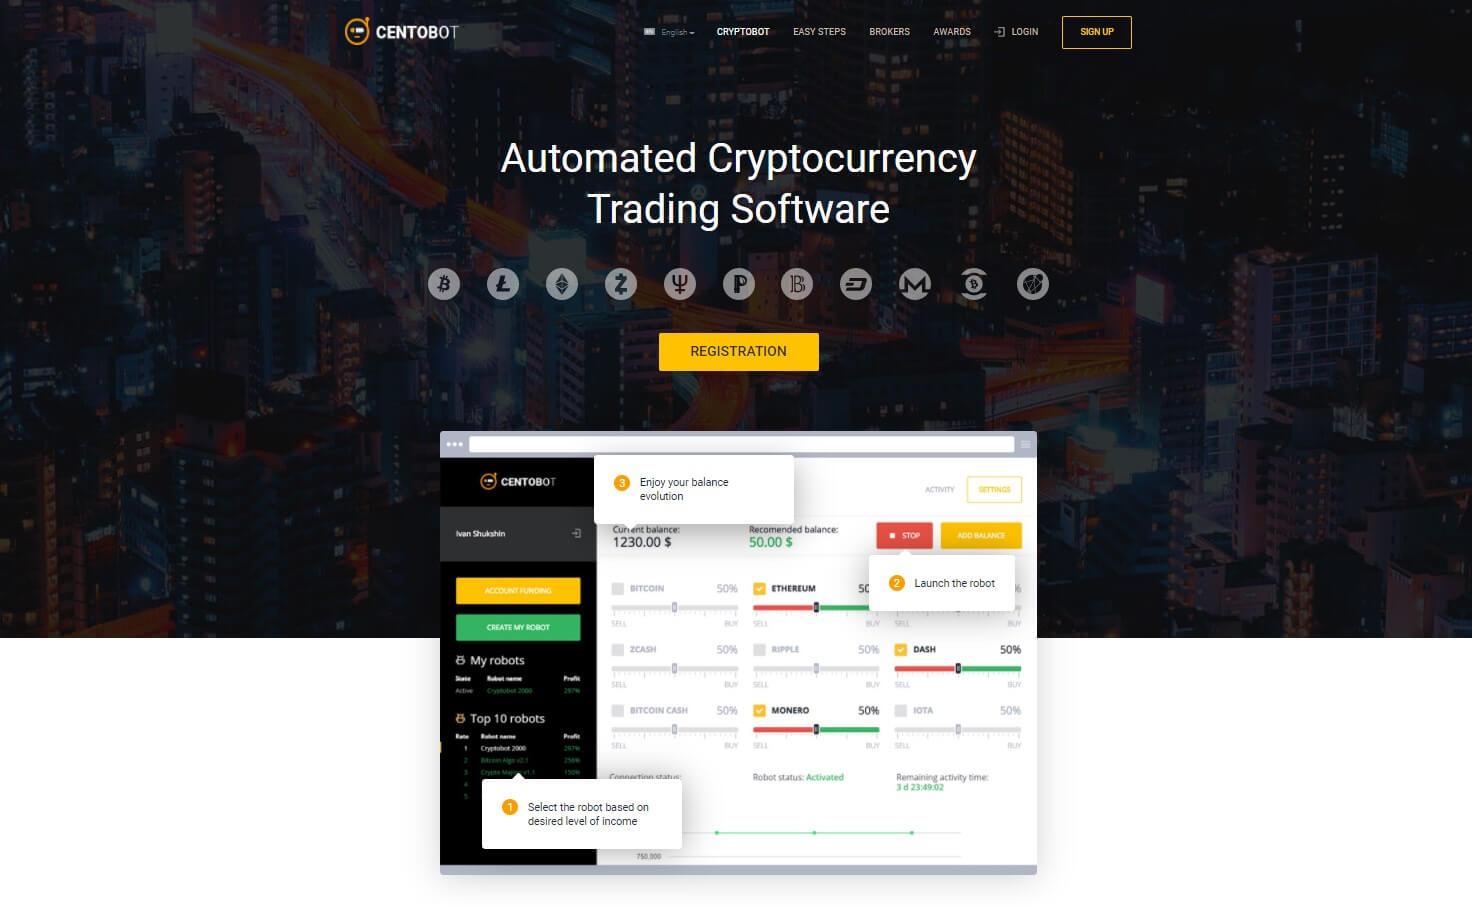 robot trading software review lavoretti per guadagnare extra